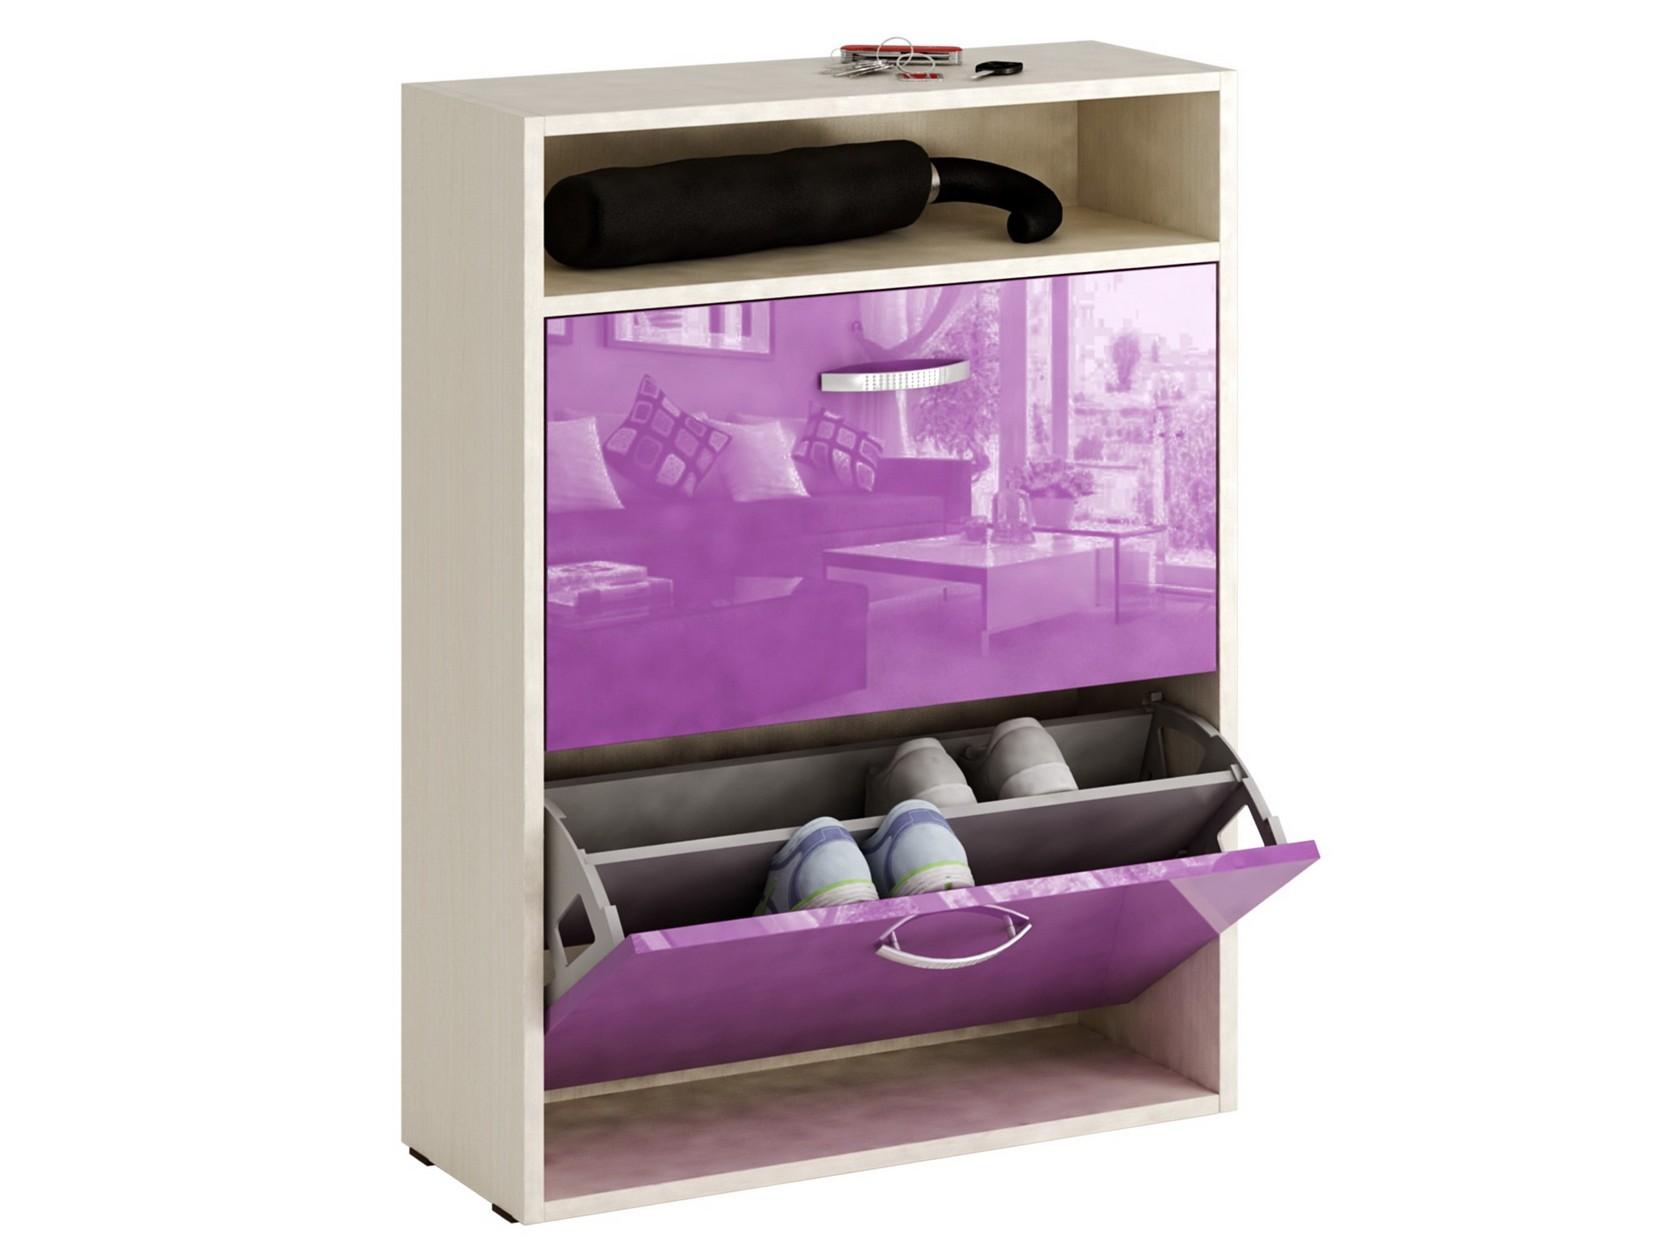 Обувница MFMaster Милан-25 МСТ-ОДМ-25 60х22,2х88,2 см, дуб молочный/фиолетовый глянец